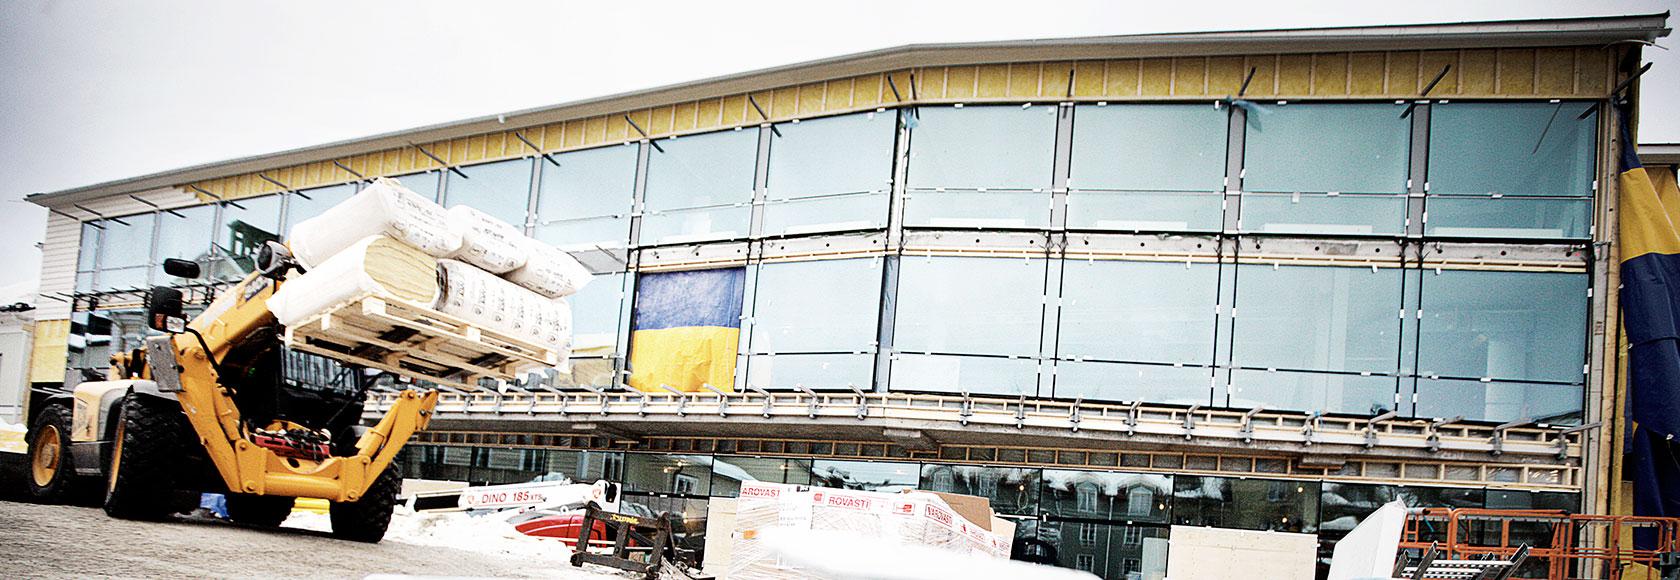 Hellströms bygger Allhuset i Piteå